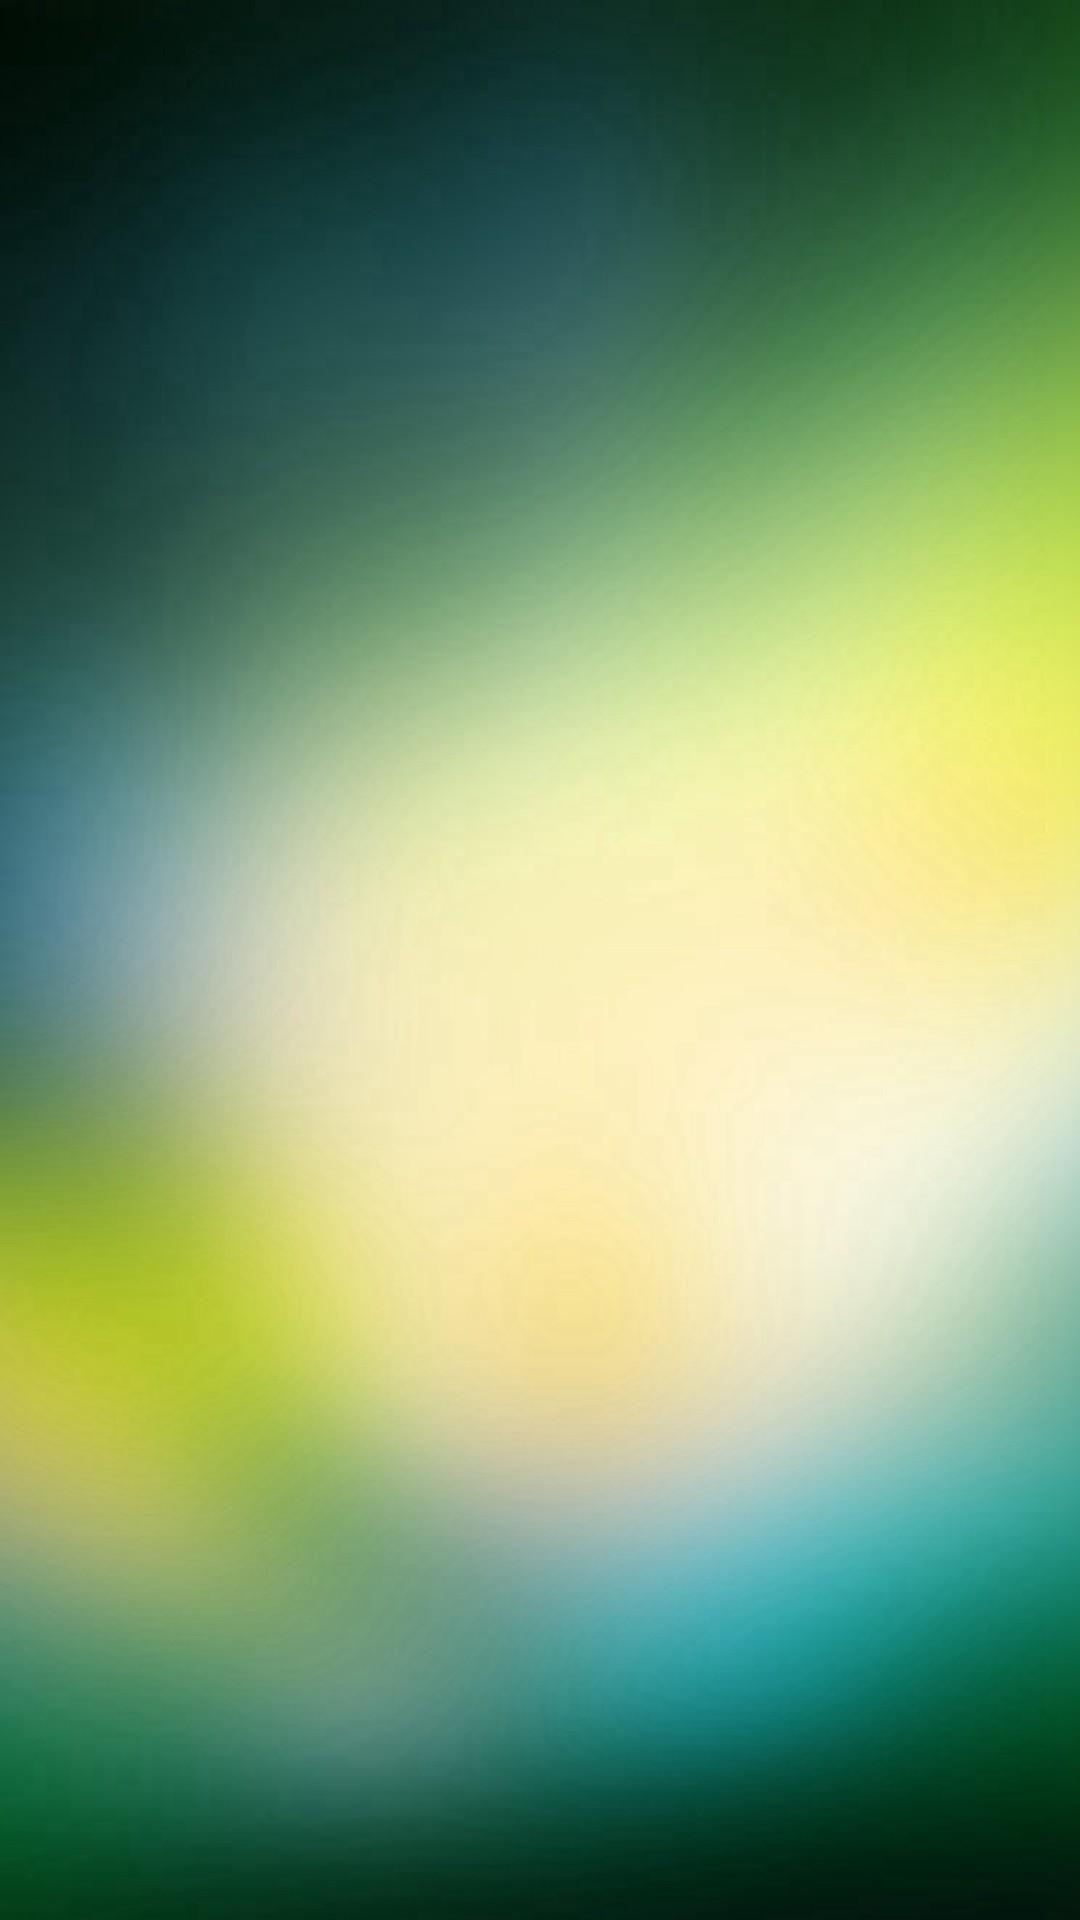 Green OS Background Gradation Blur #iPhone #6 #plus #wallpaper